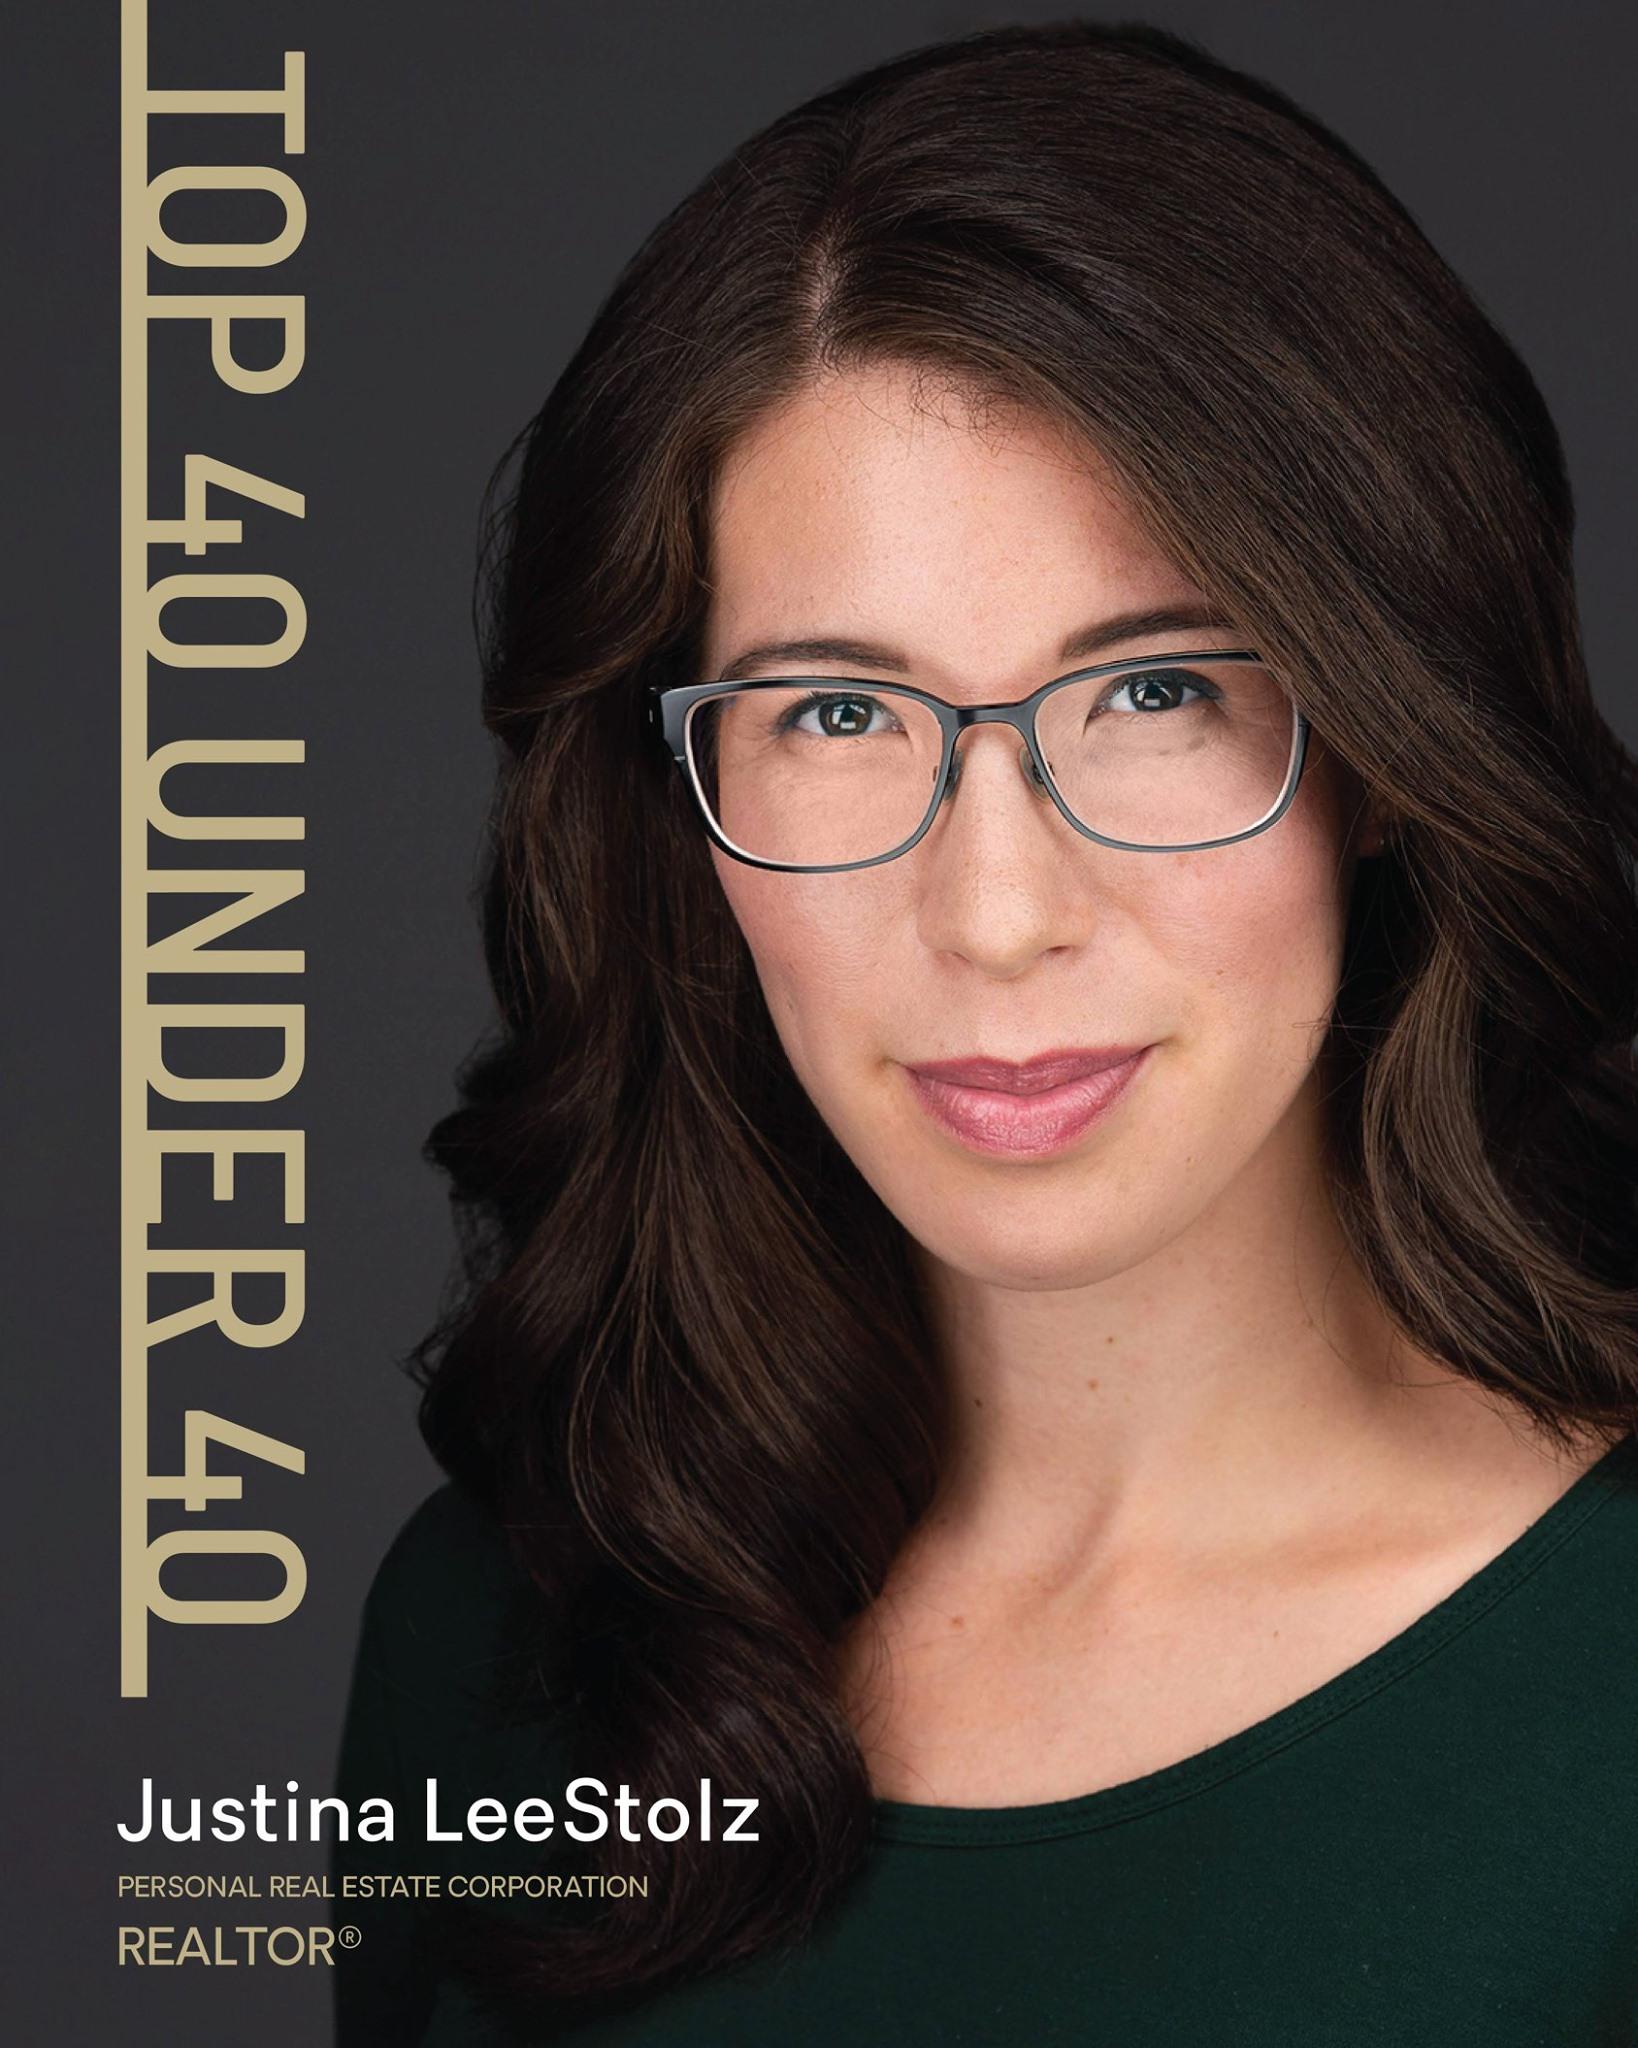 Justina LeeStolz, CENTURY 21 Assurance Realty Ltd